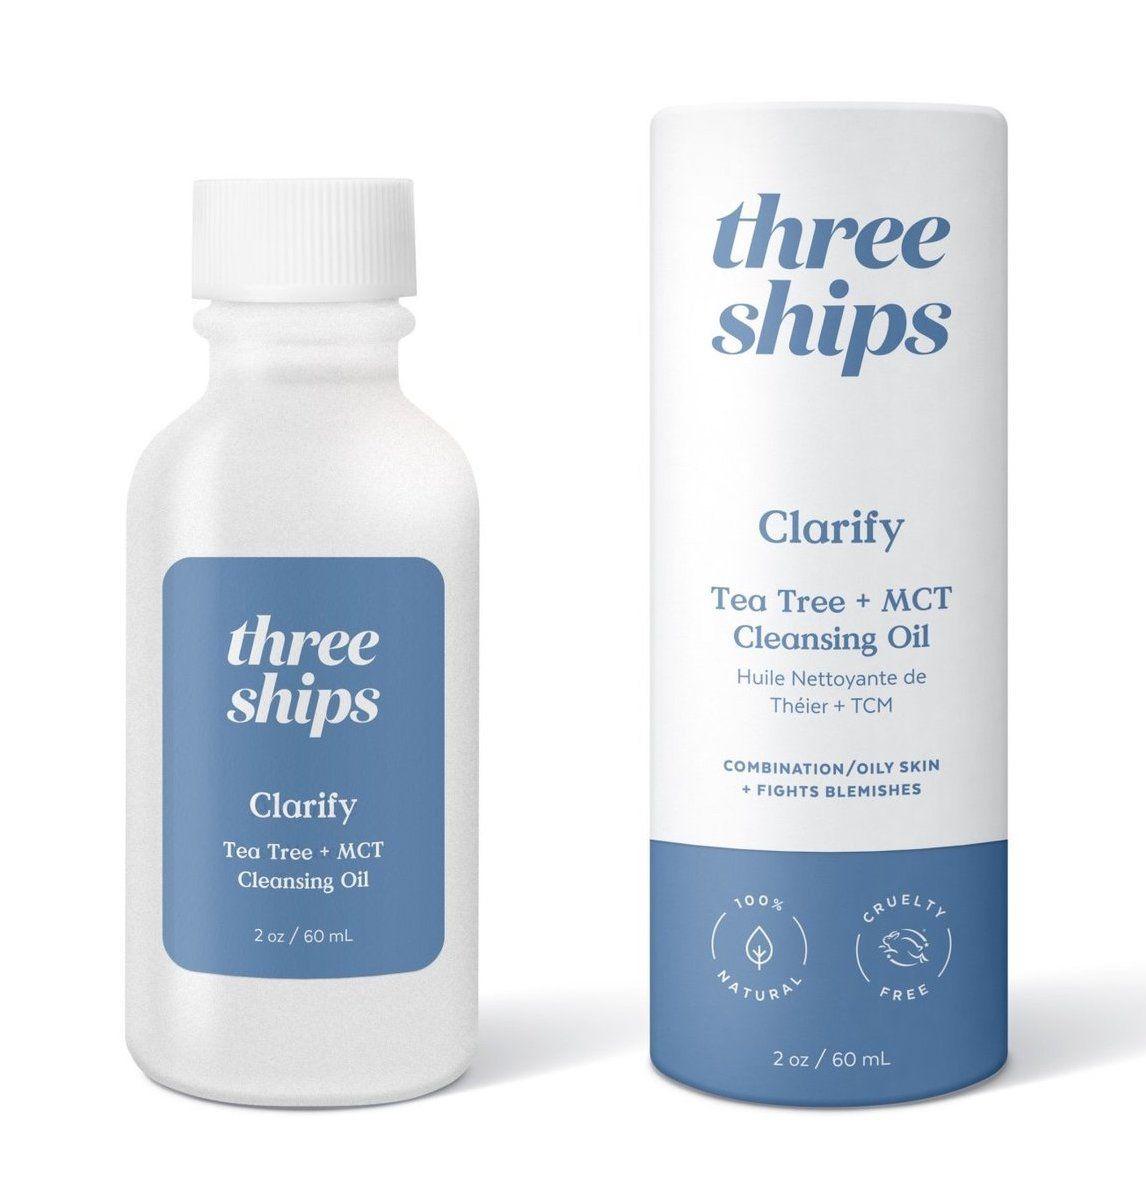 Three Ships Clarify Tea Tree Cleansing Oil